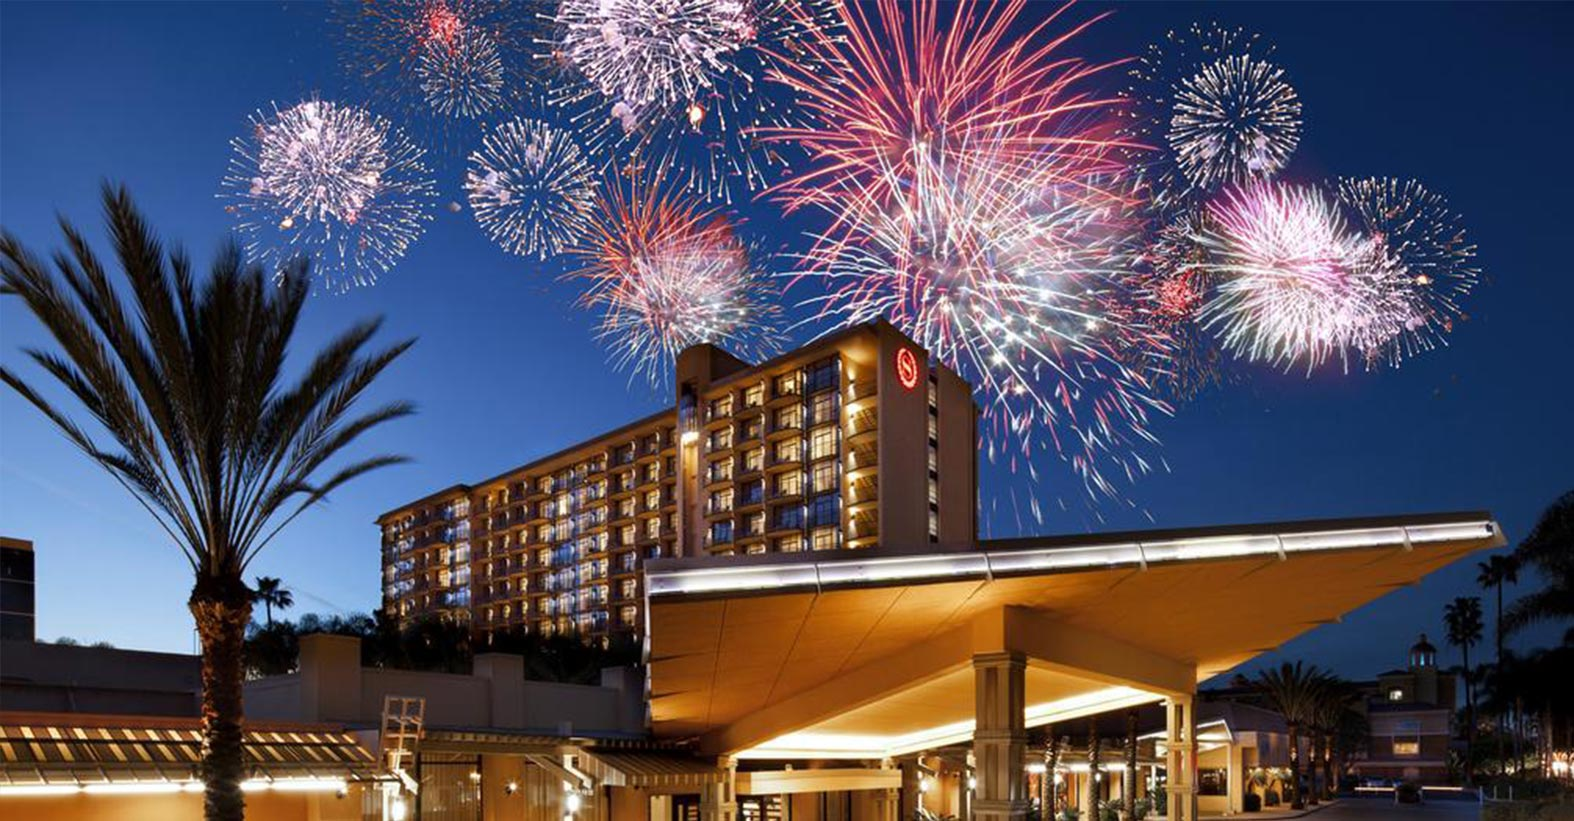 Sheraton Park Hotel in Anaheim, CA